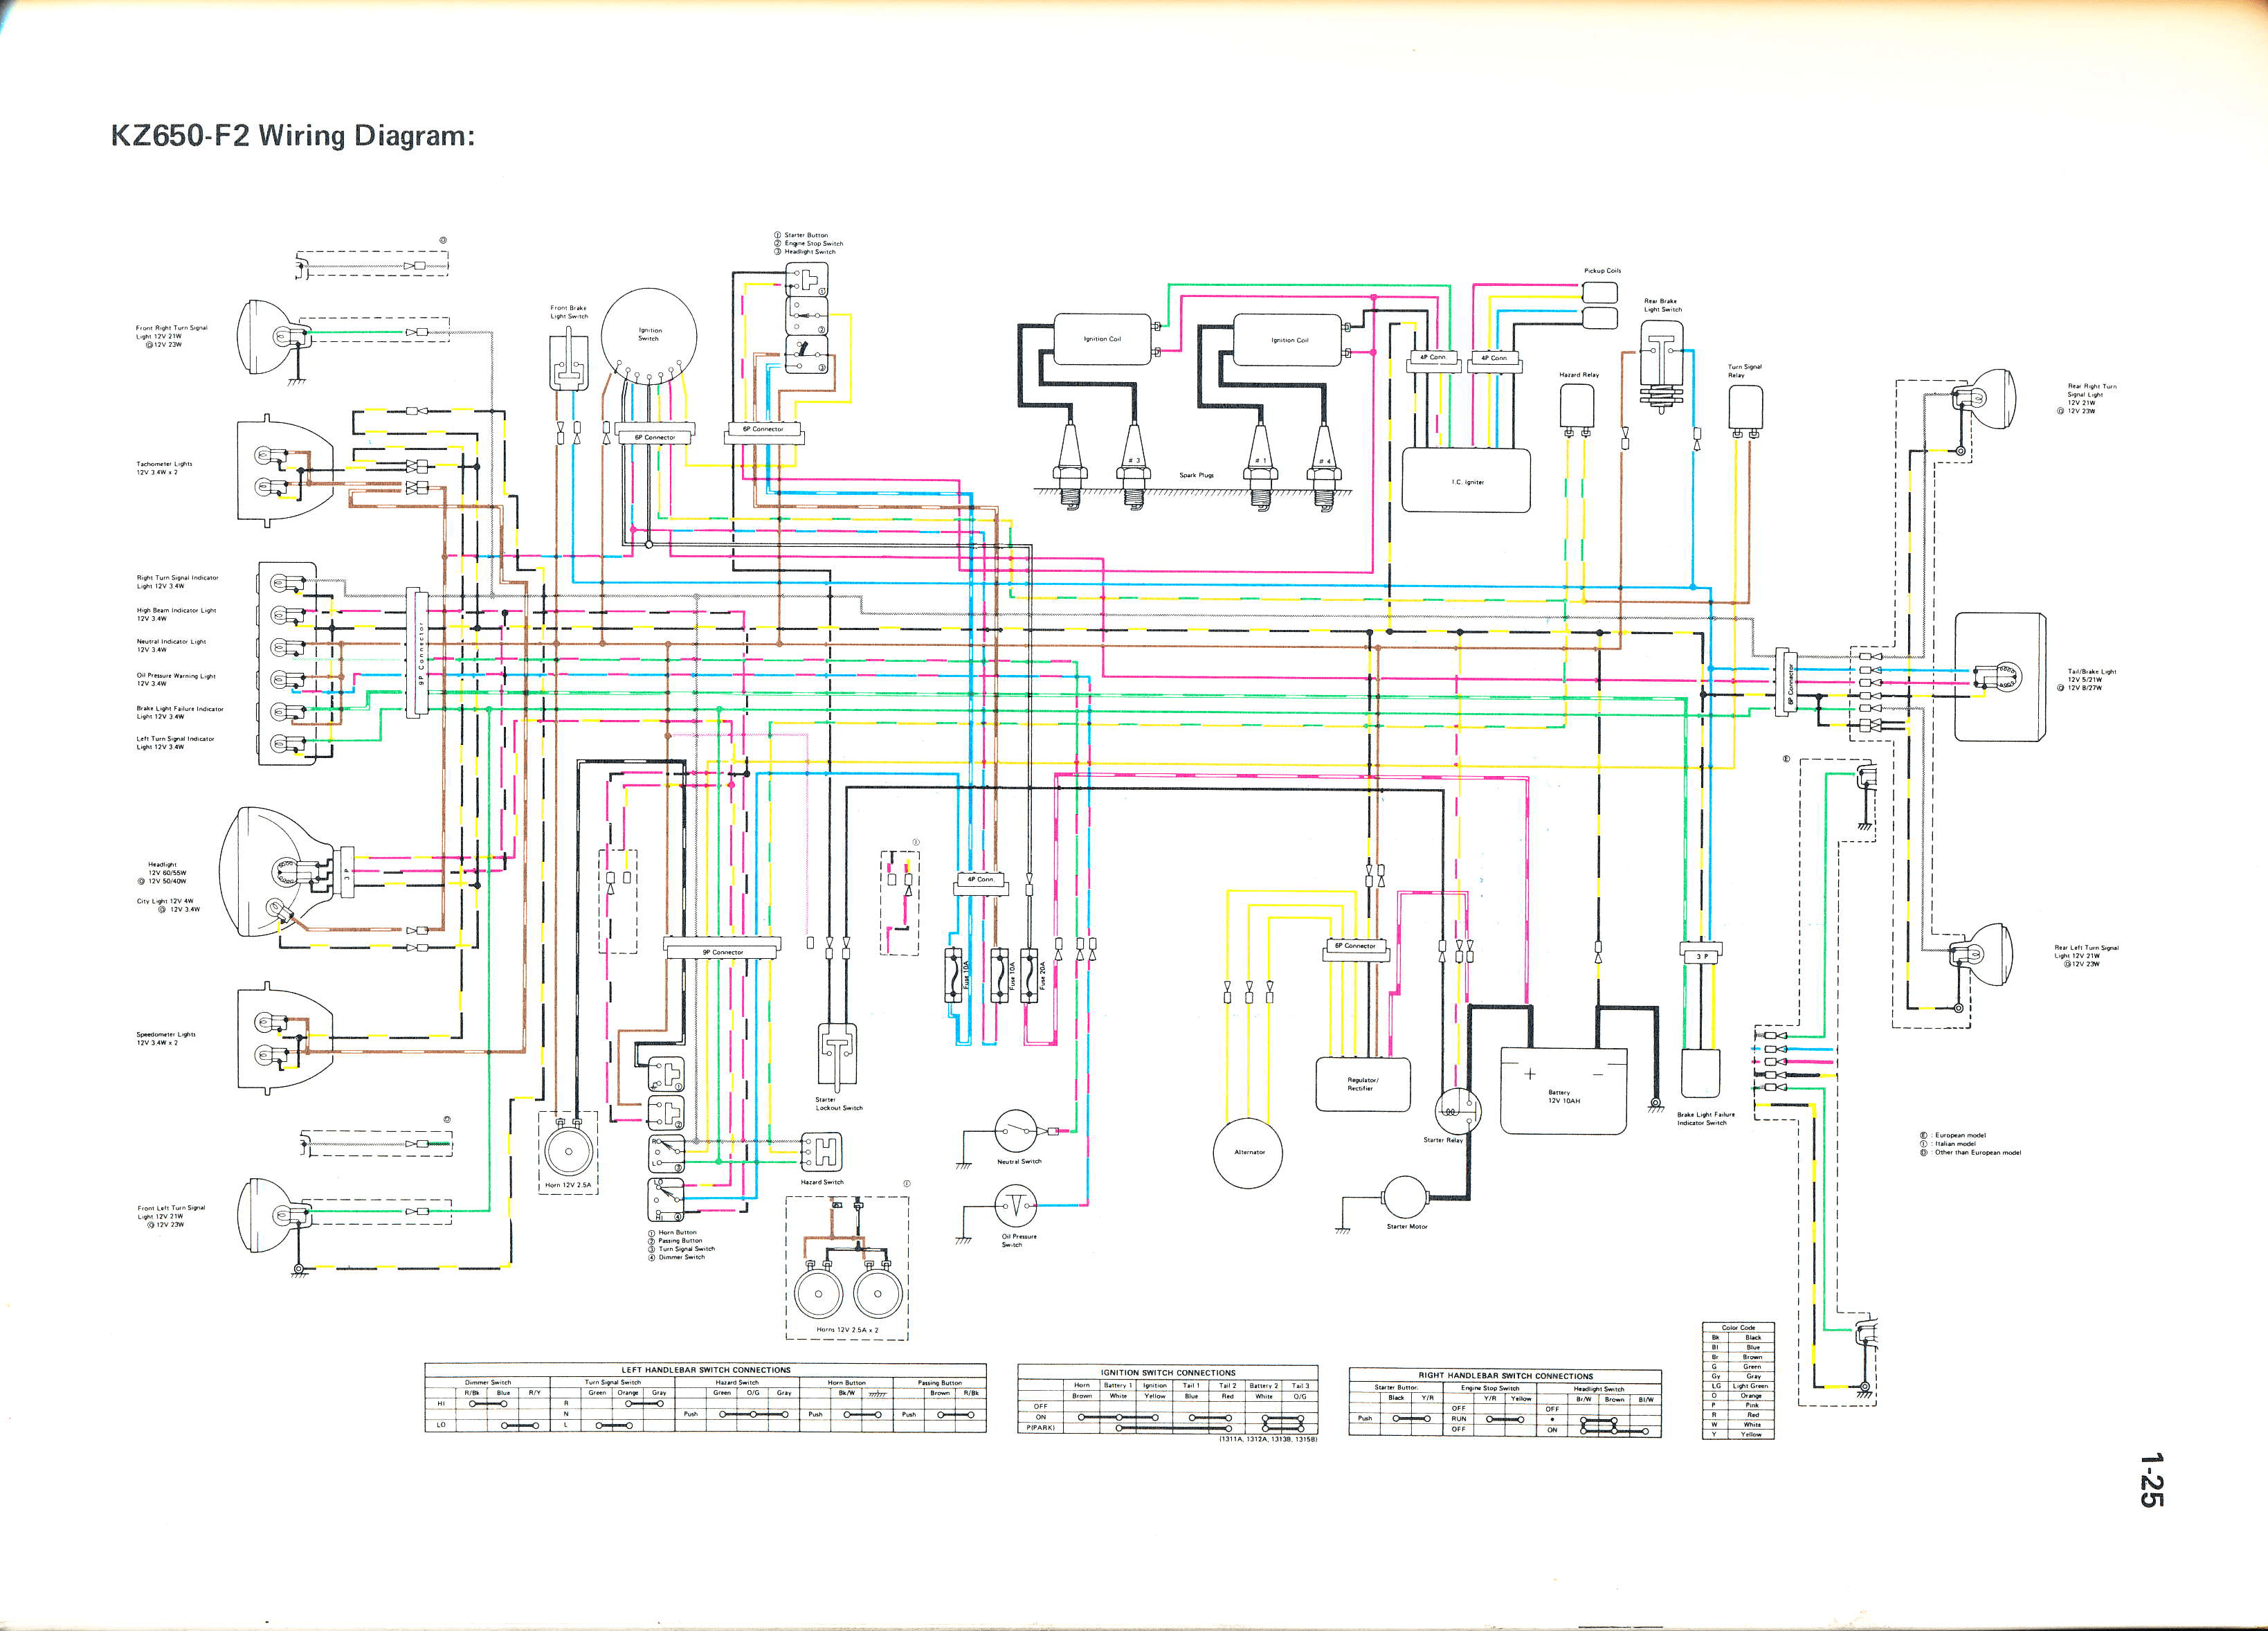 John Deere 2510 Wiring Harness 1010 Jd 2040 Diagram 3020 Positive Ground